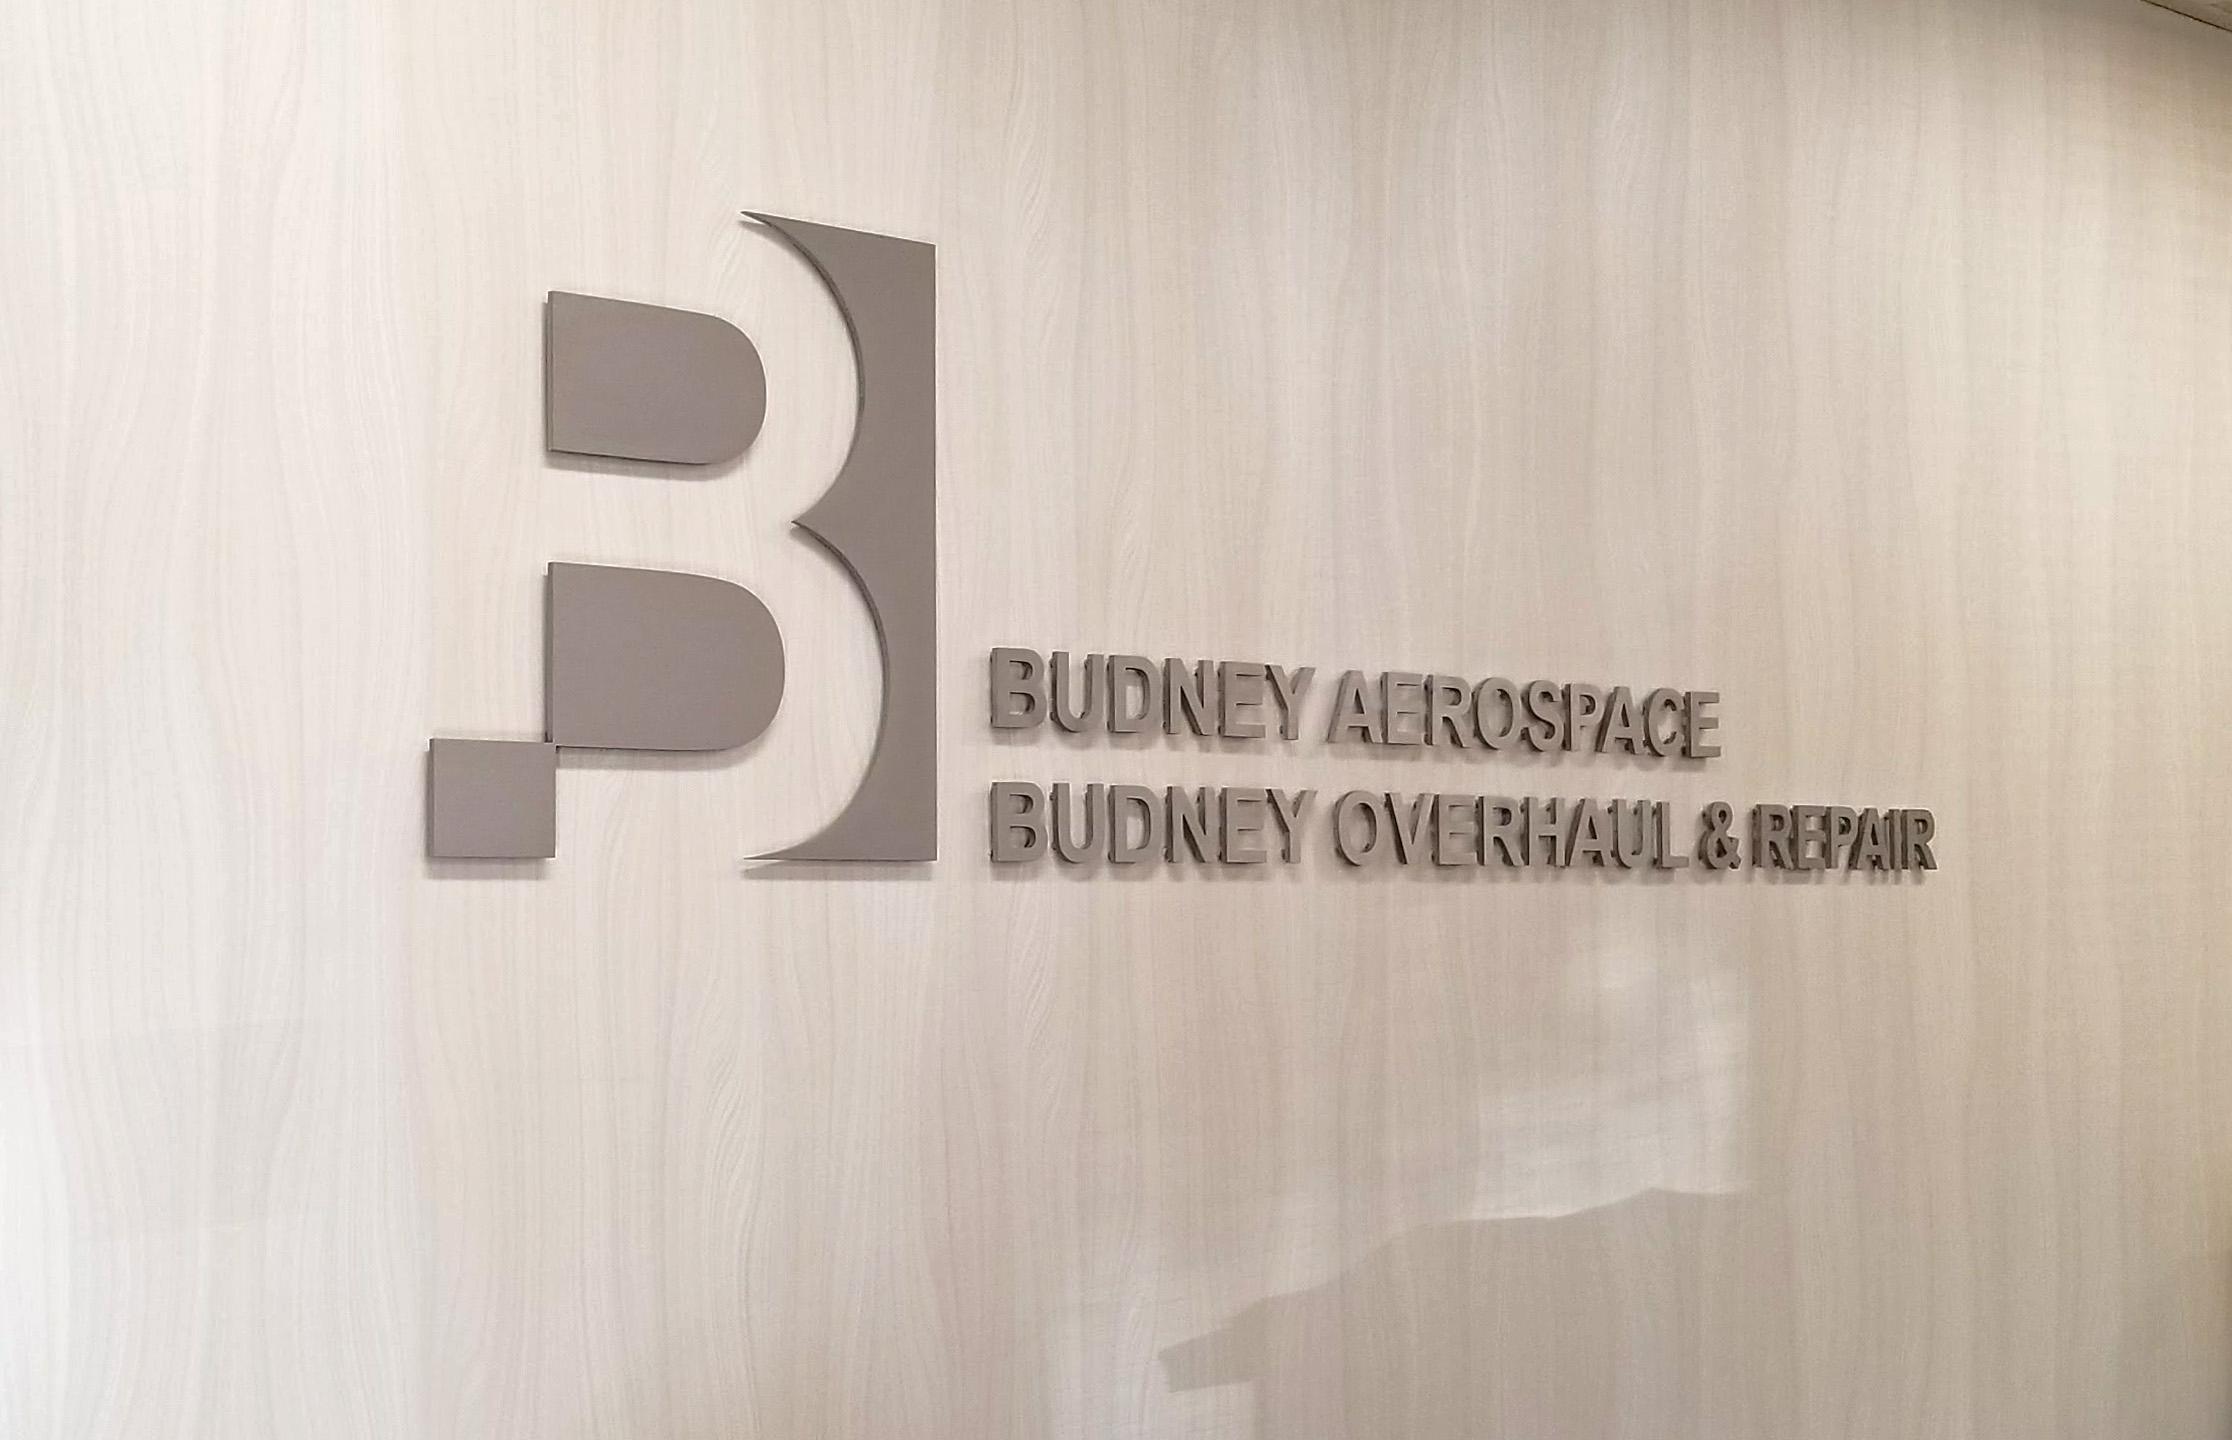 Budney Aerospace lobby sign (2)